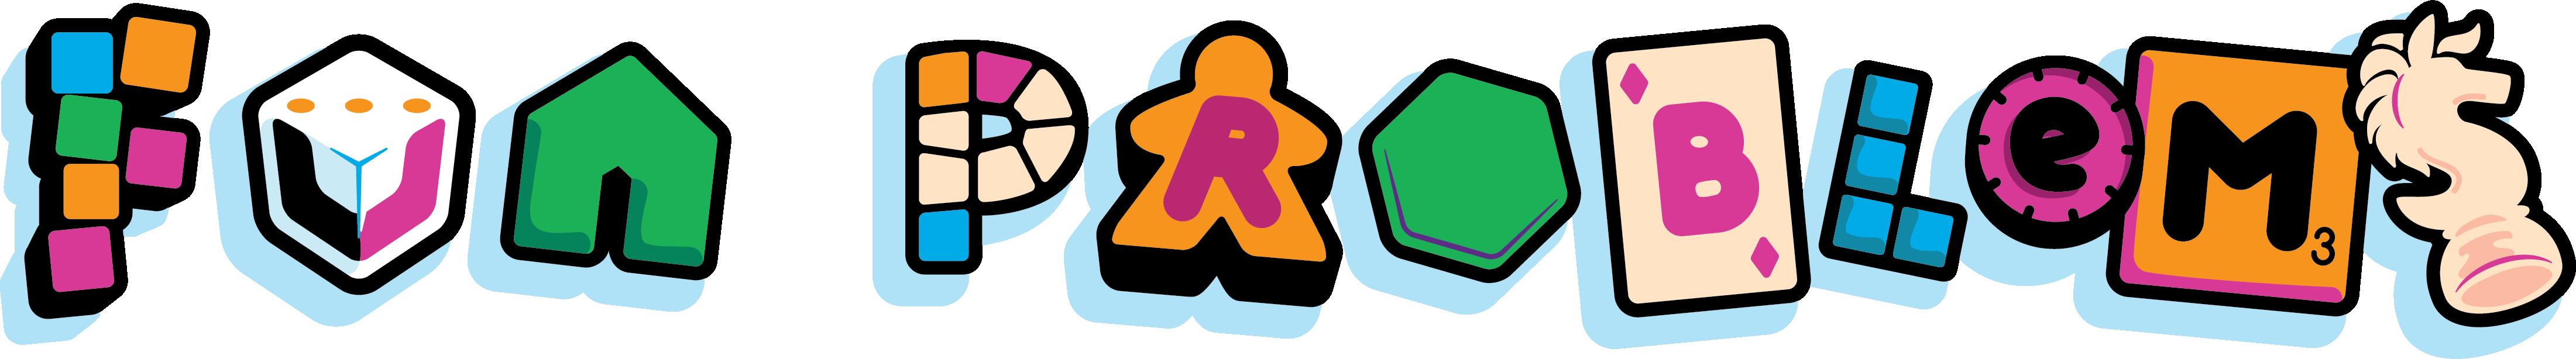 Fun Problems logo